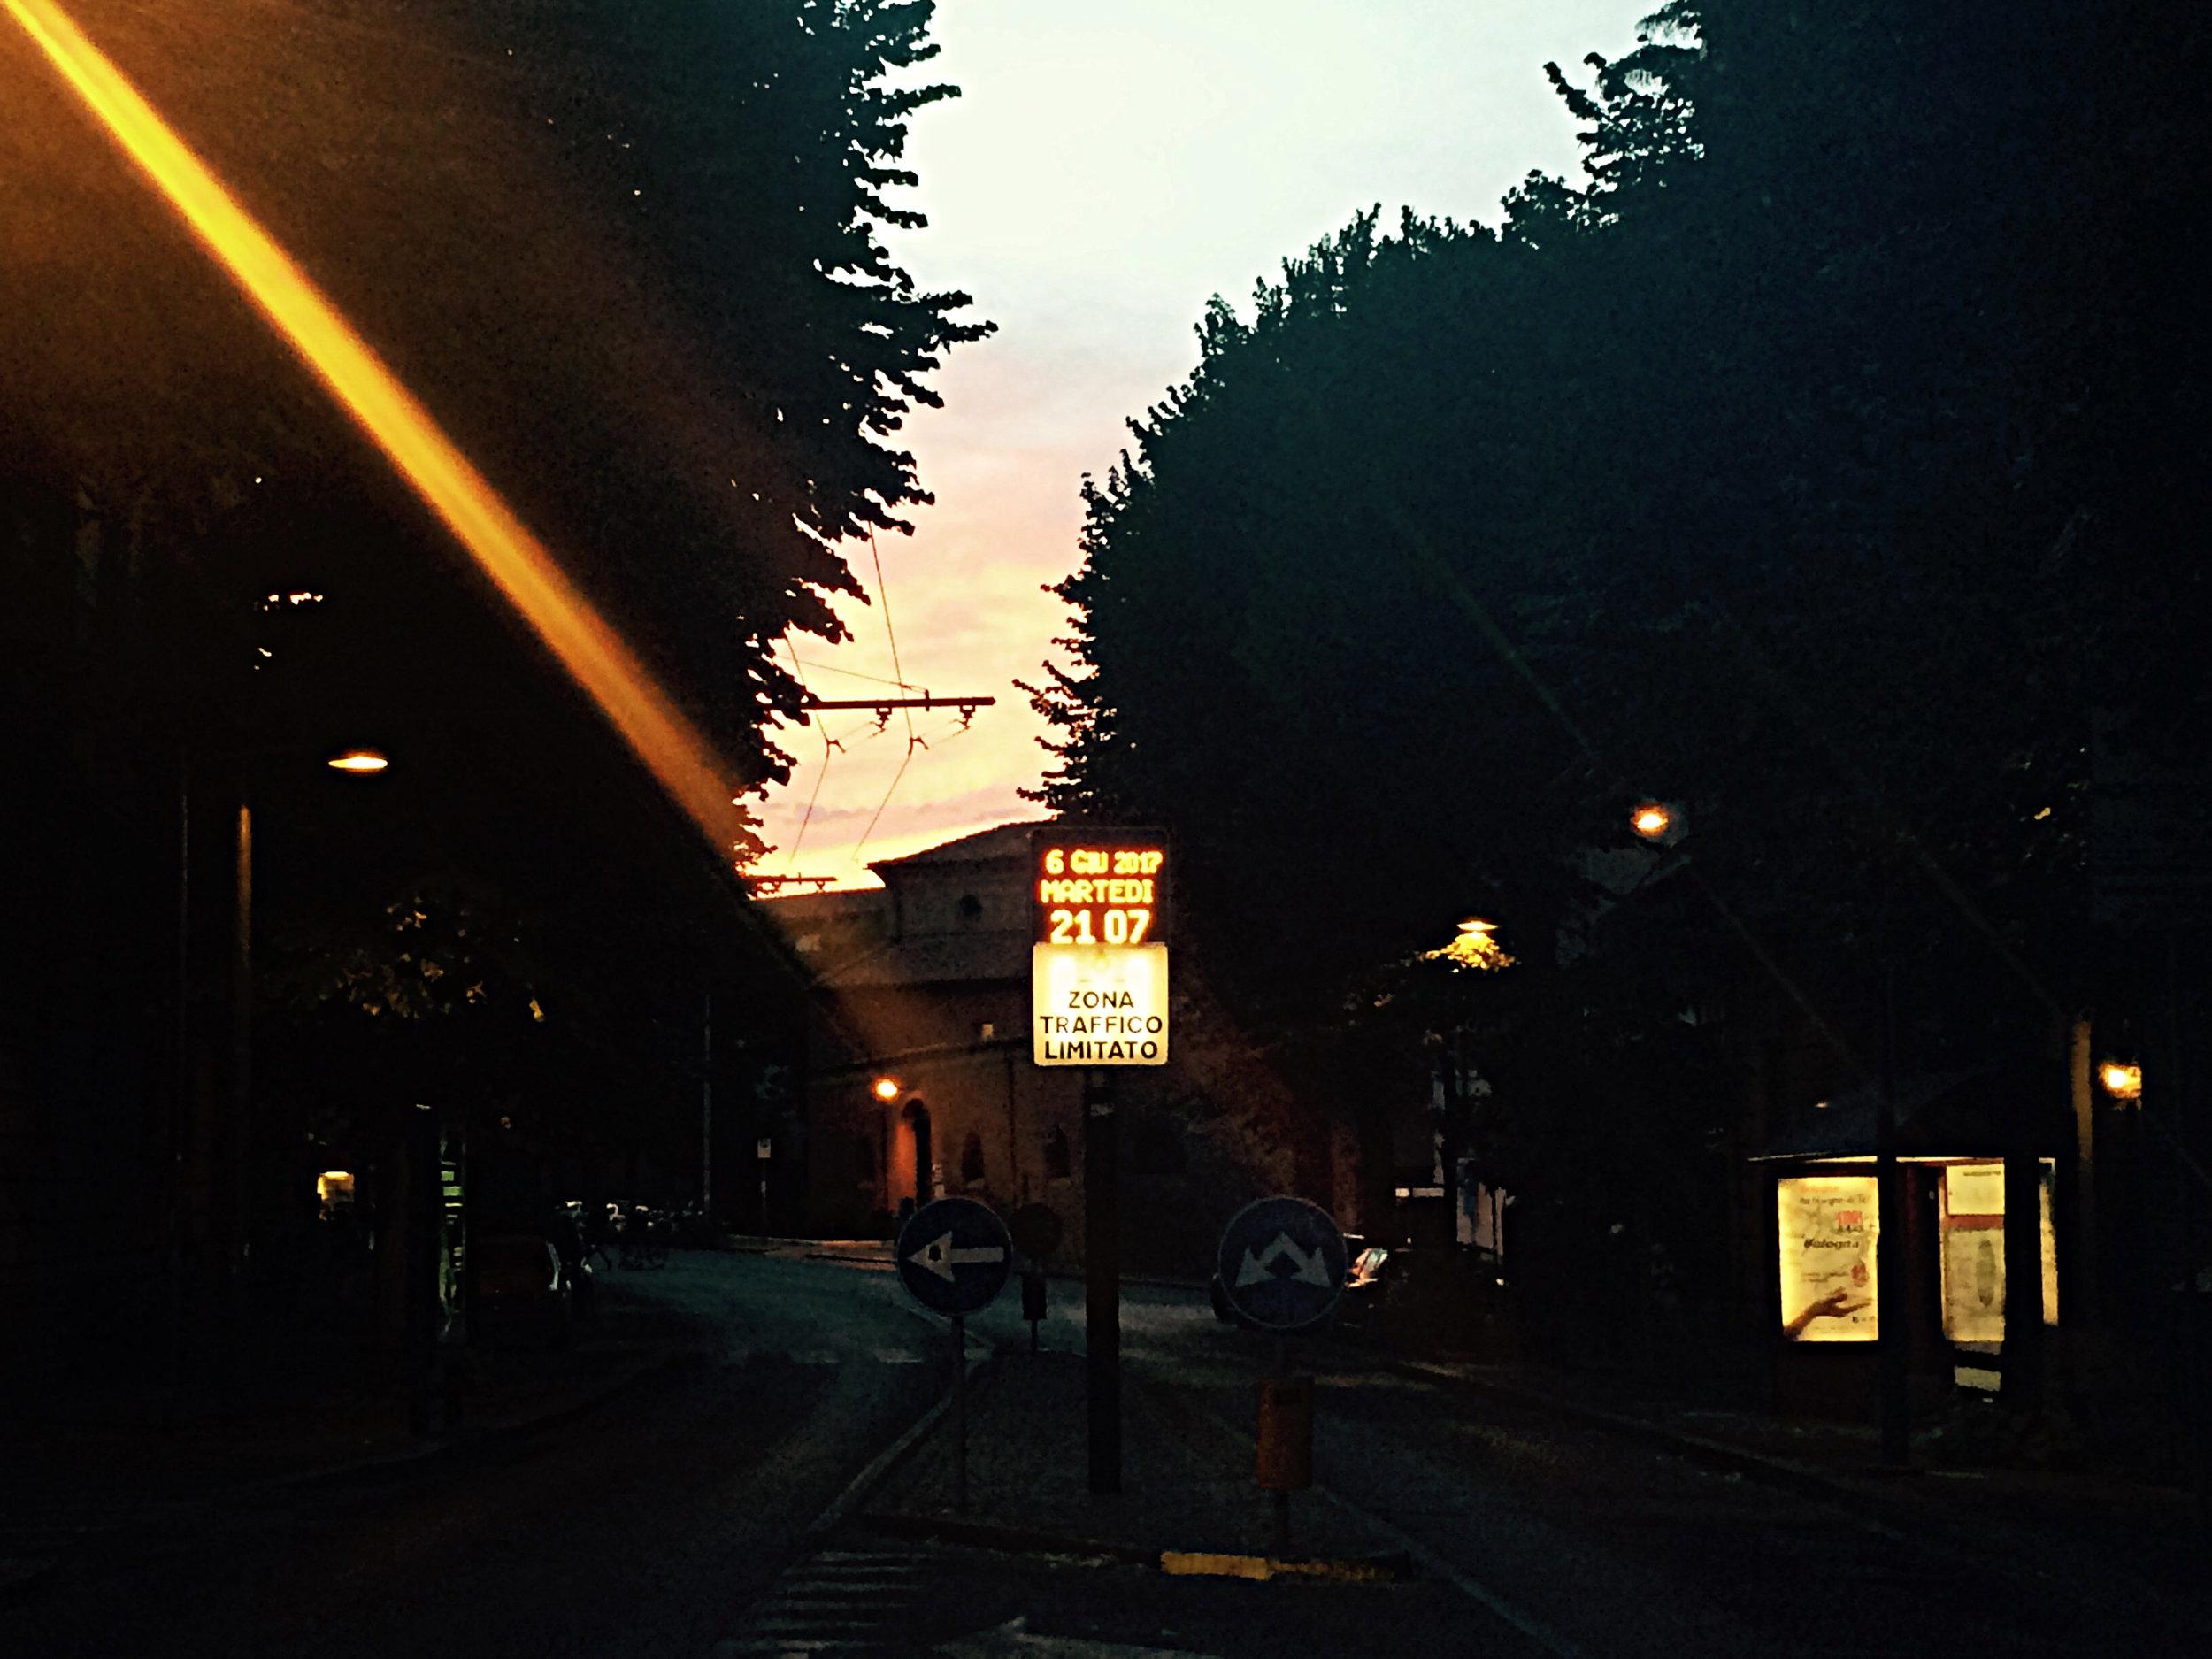 Walking at Night_The Sun Has Set and We Begun to Walk.jpg